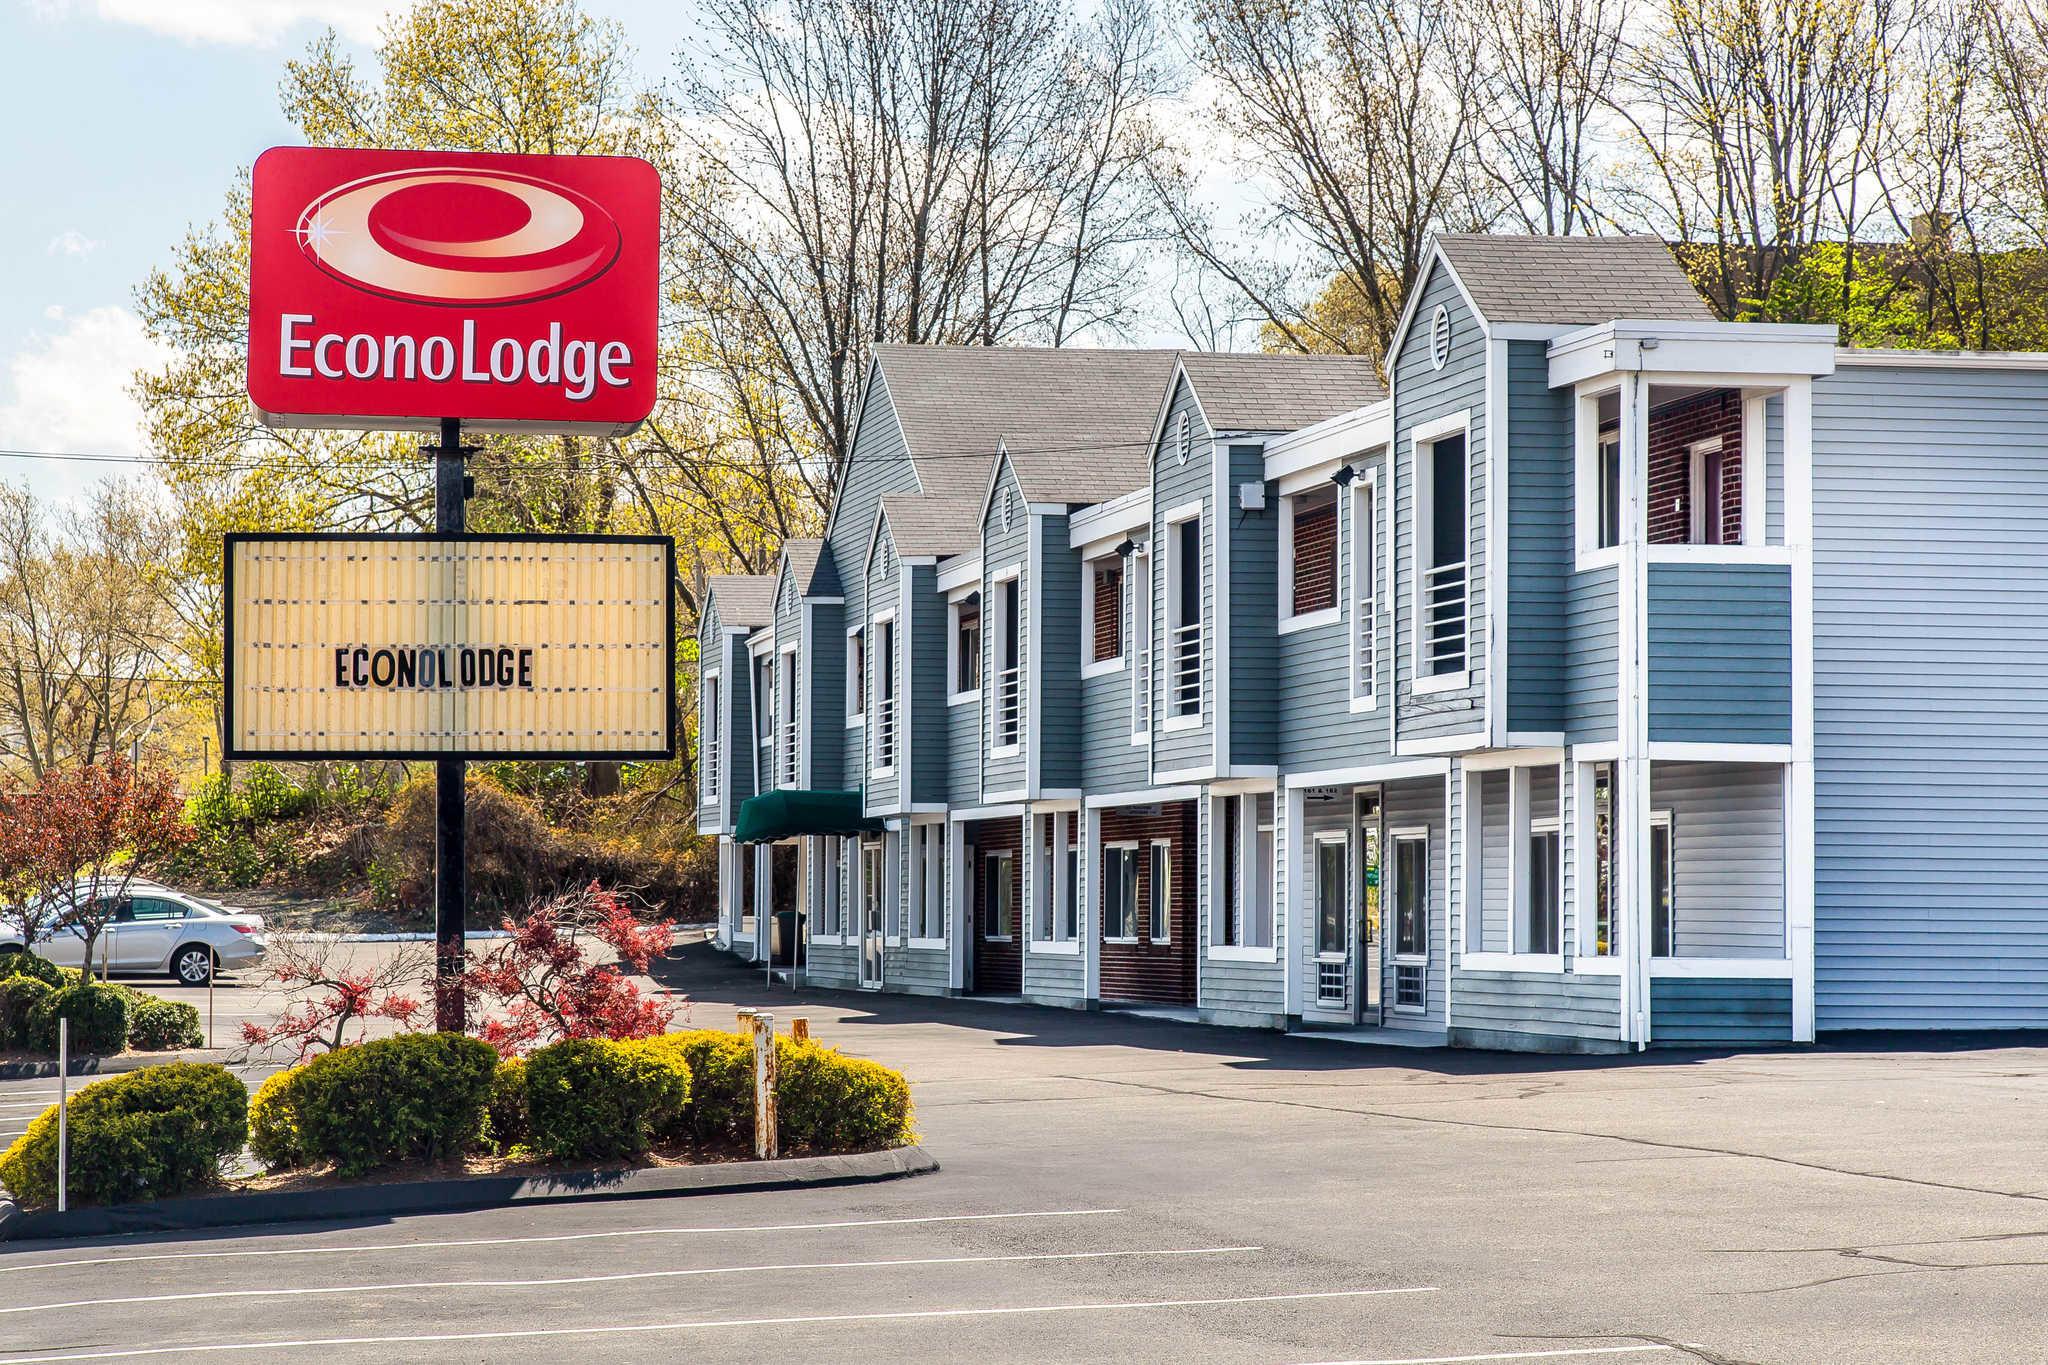 Econo Lodge image 1